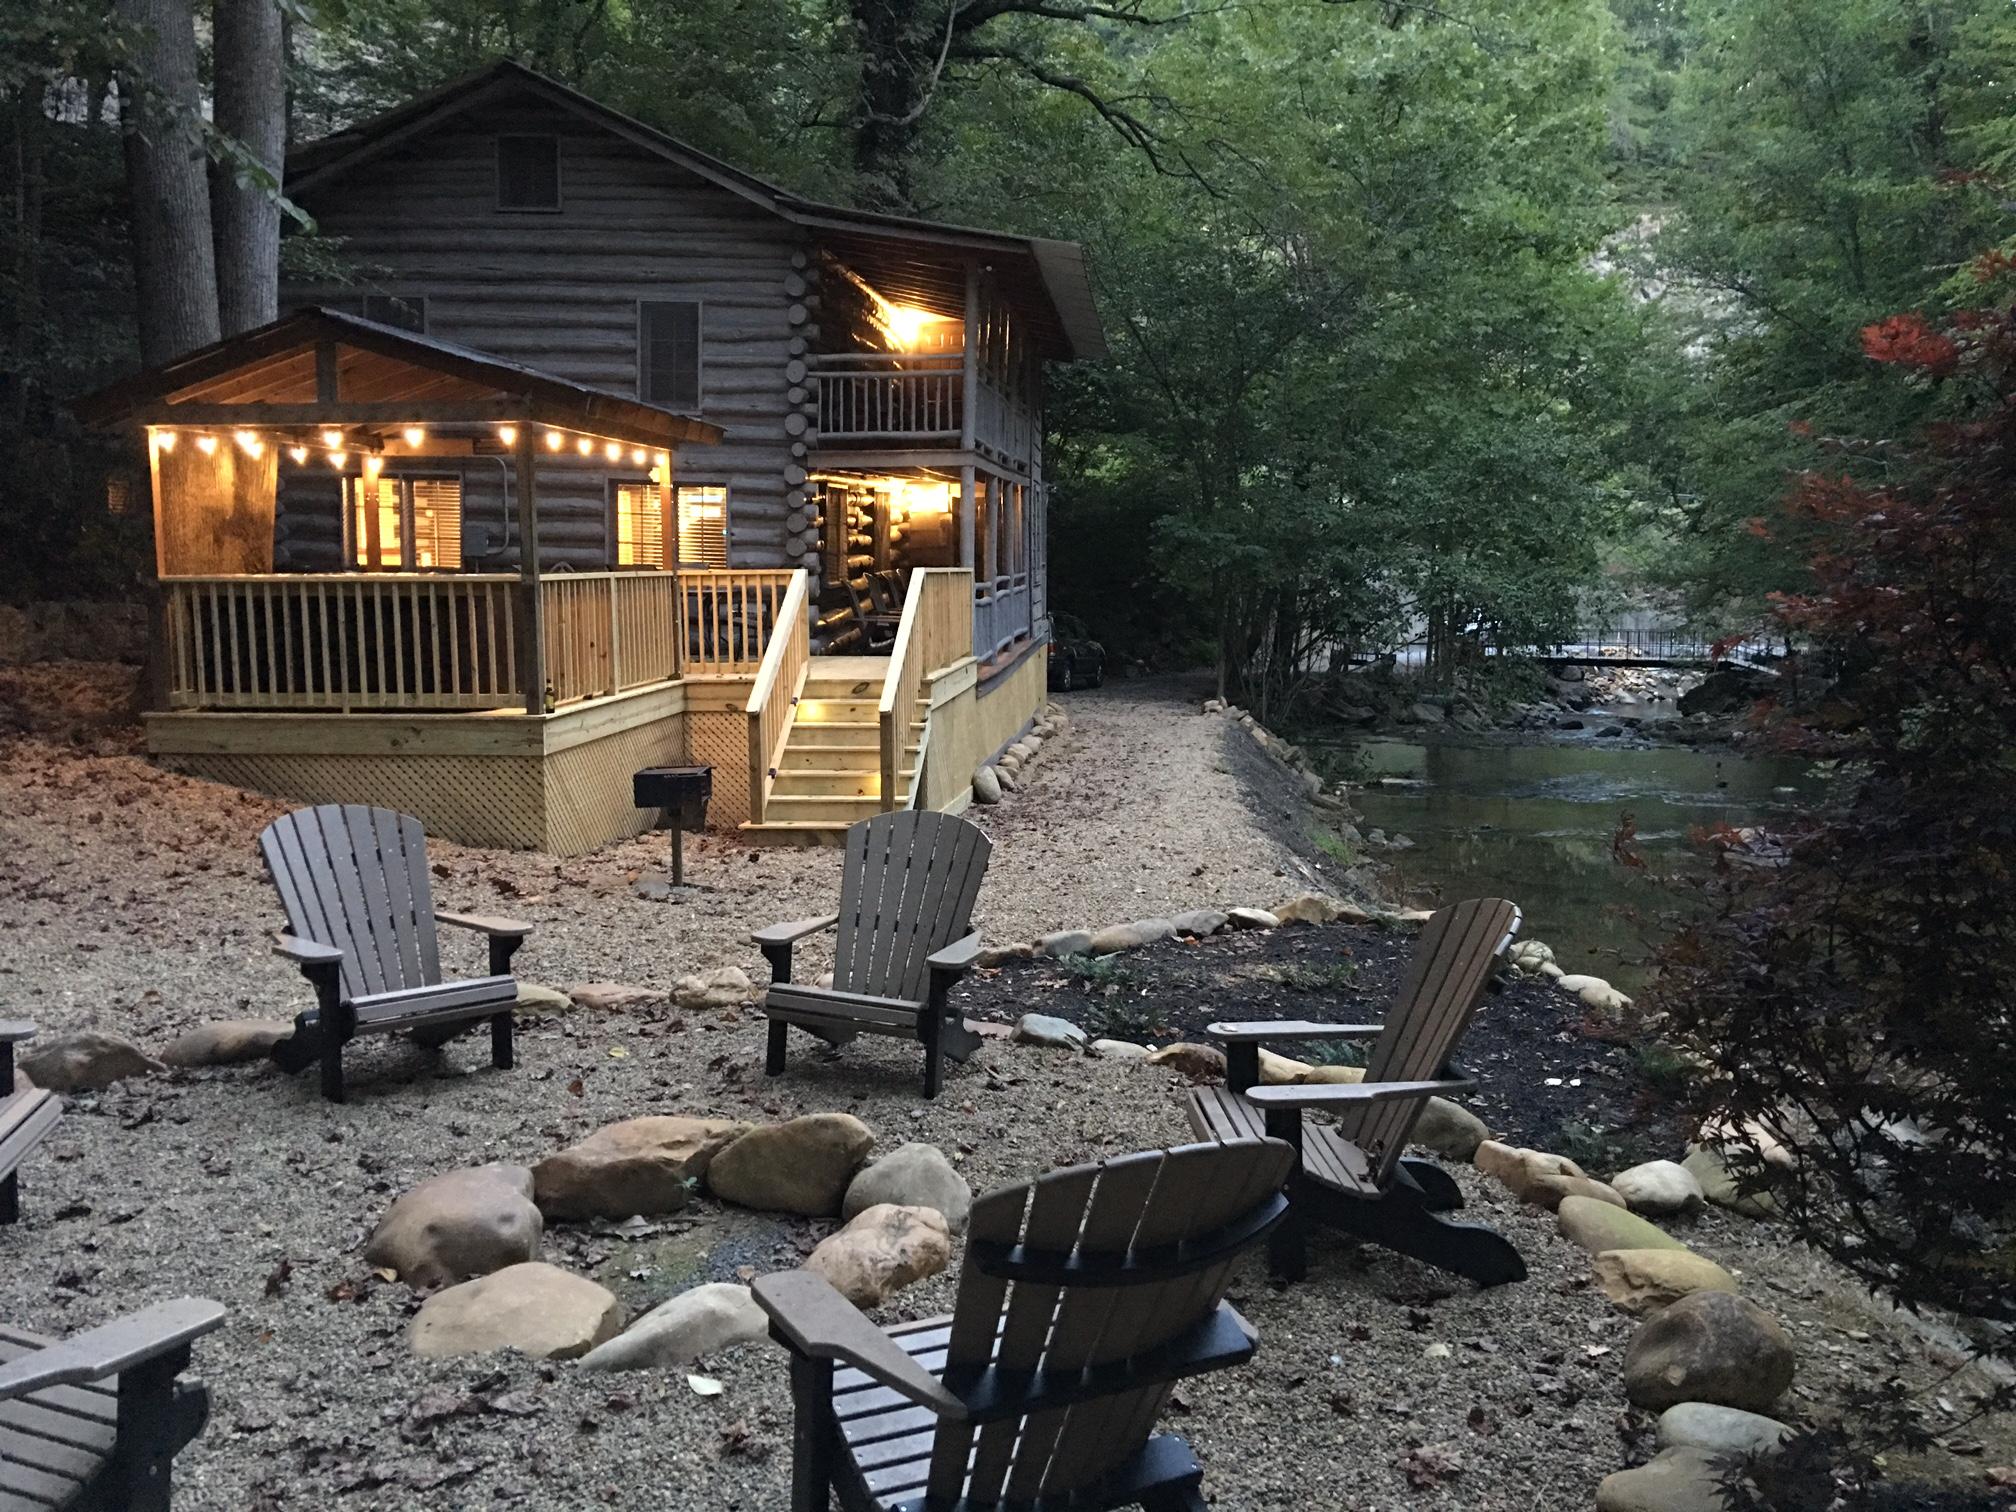 Pigeon forge cabin waterfall 39 s edge 3 bedroom sleeps 8 for Cabin rentals of gatlinburg